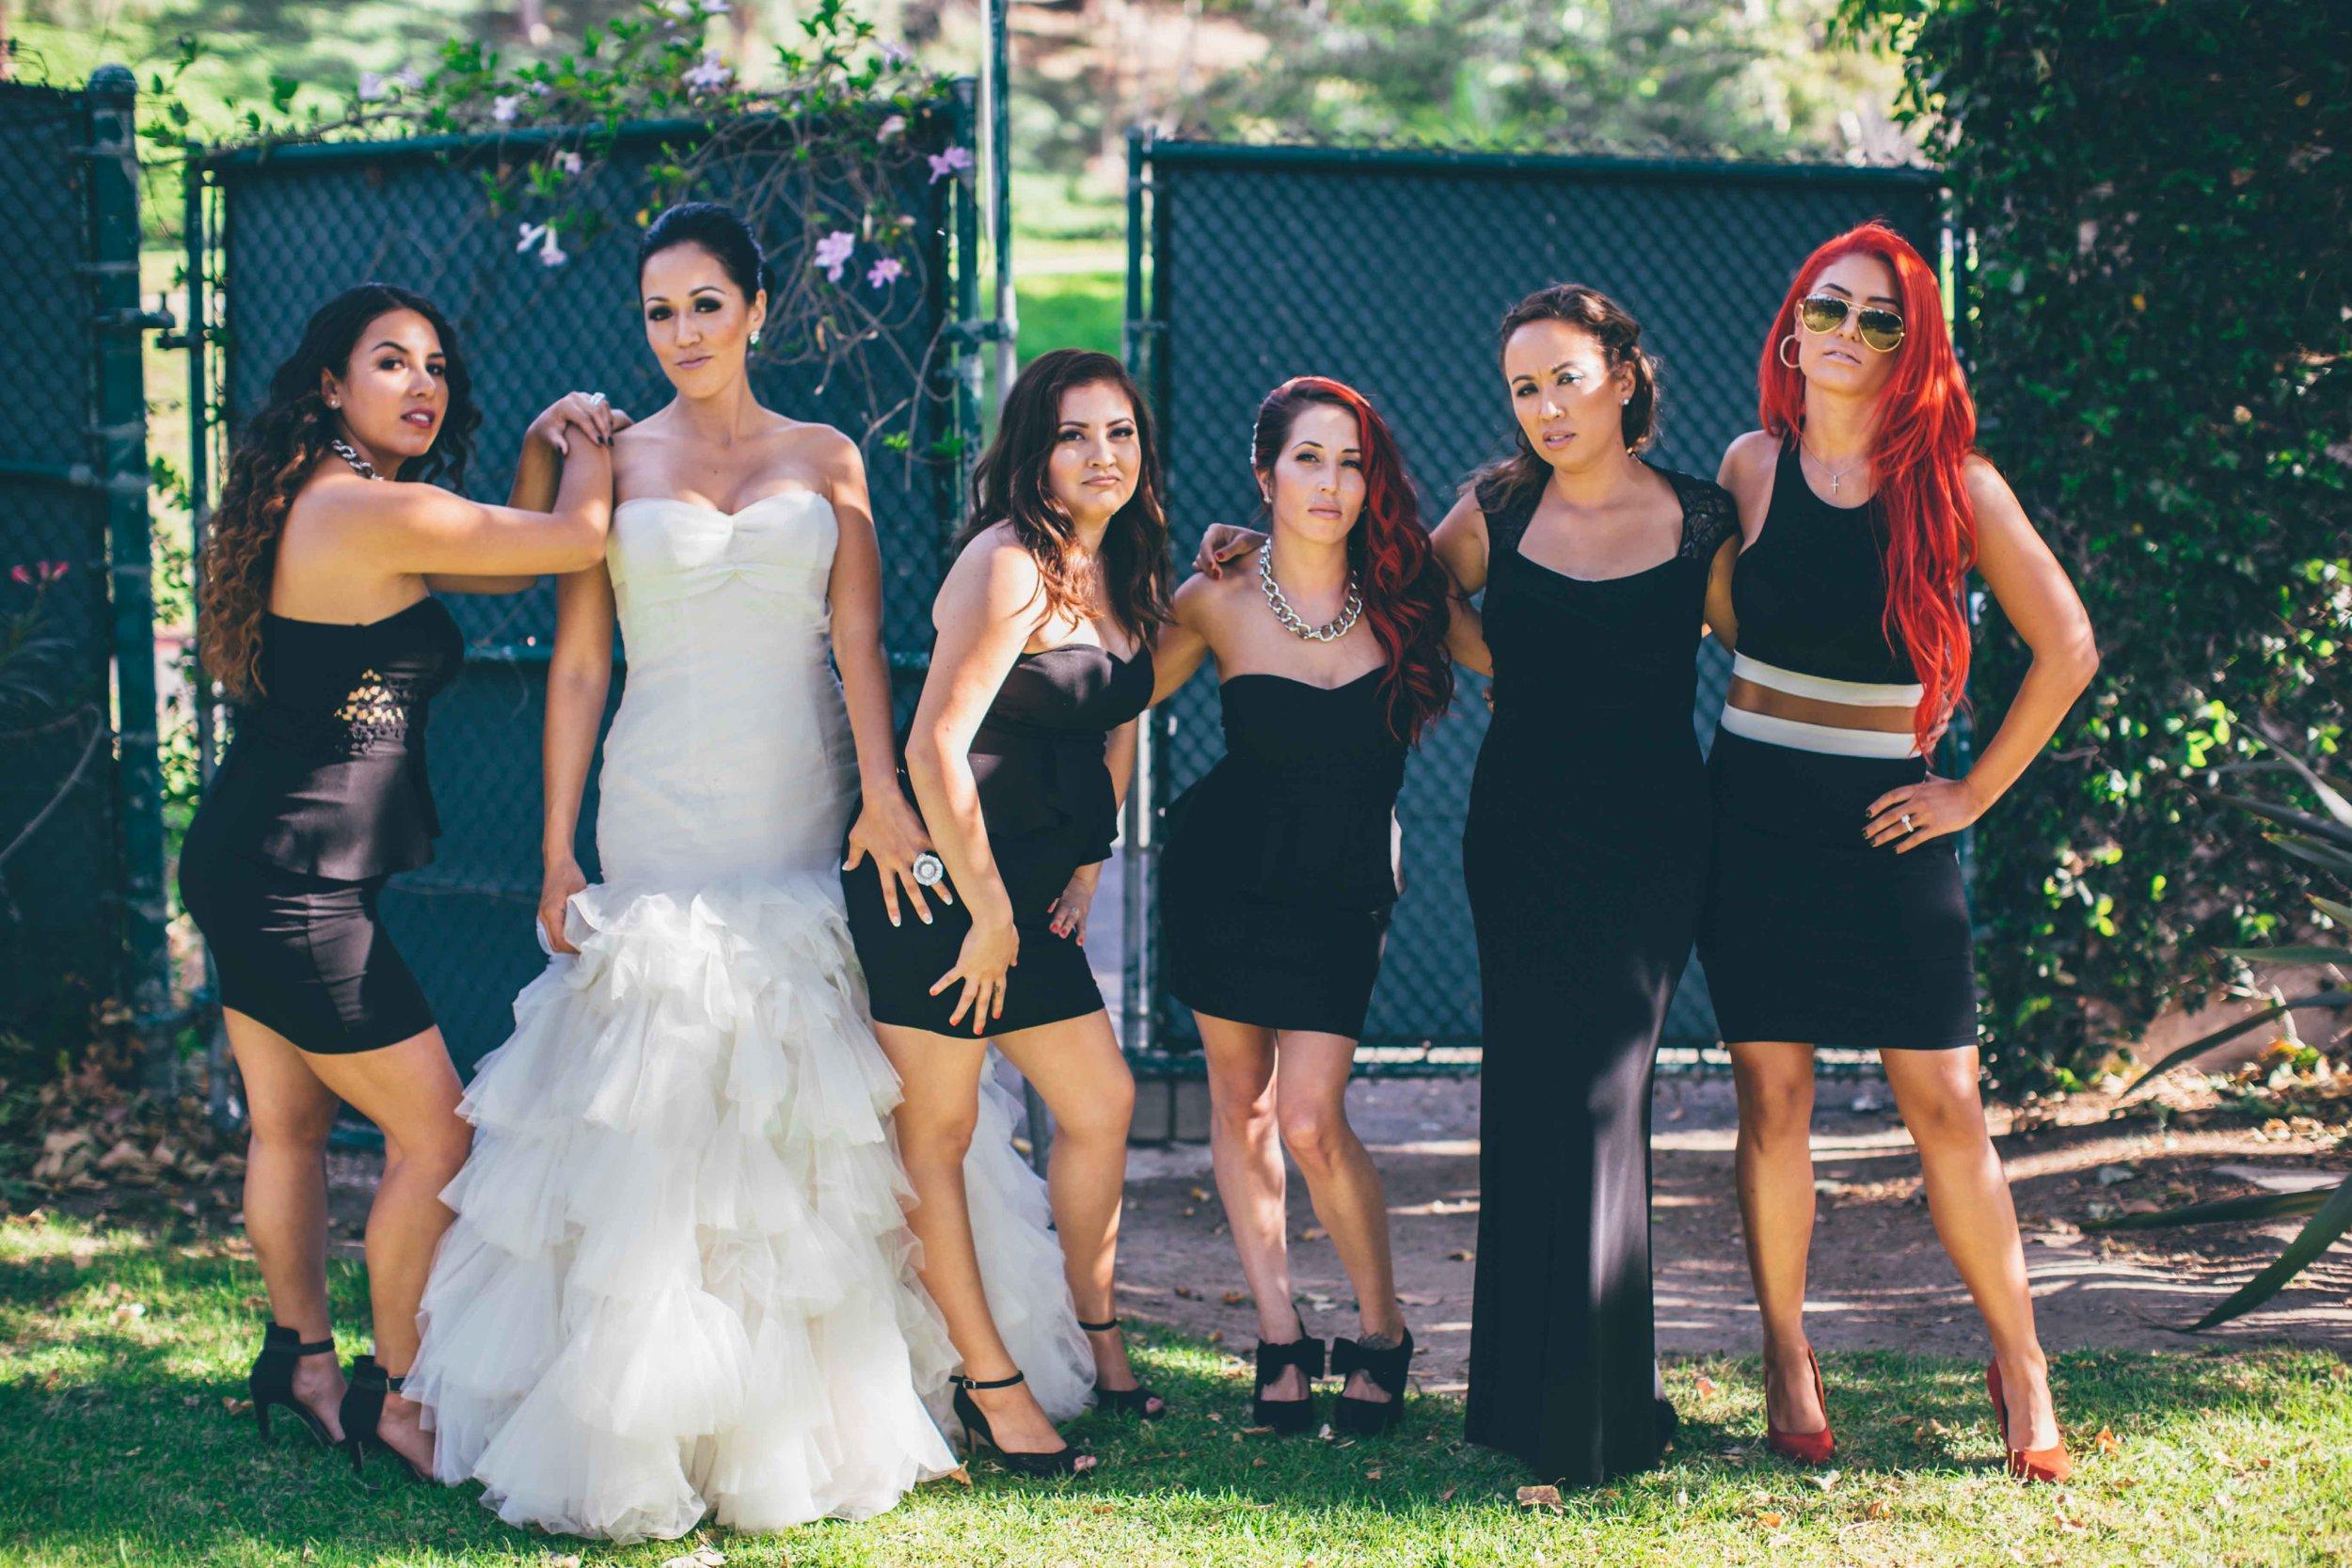 APavone-Photographer-Orange-County-Diamond-Bar-Wedding-046.jpg